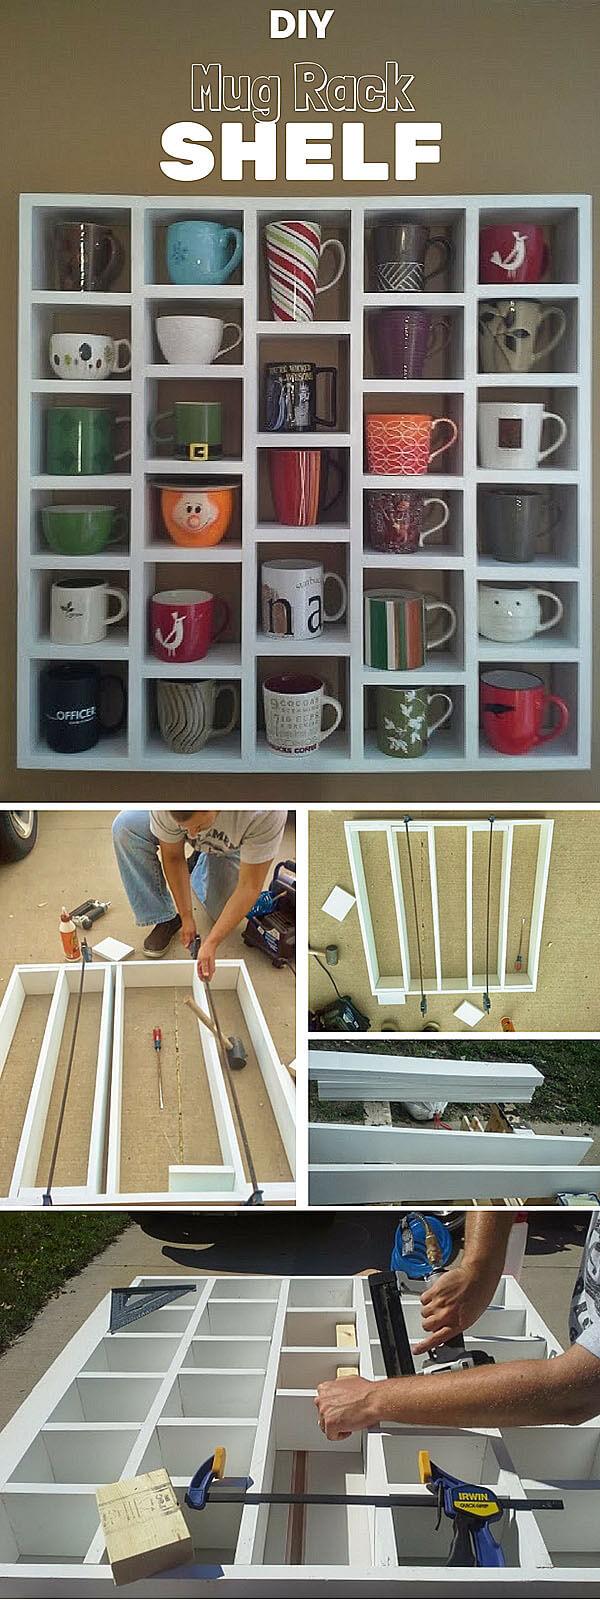 DIY Mug Cubby Shelves